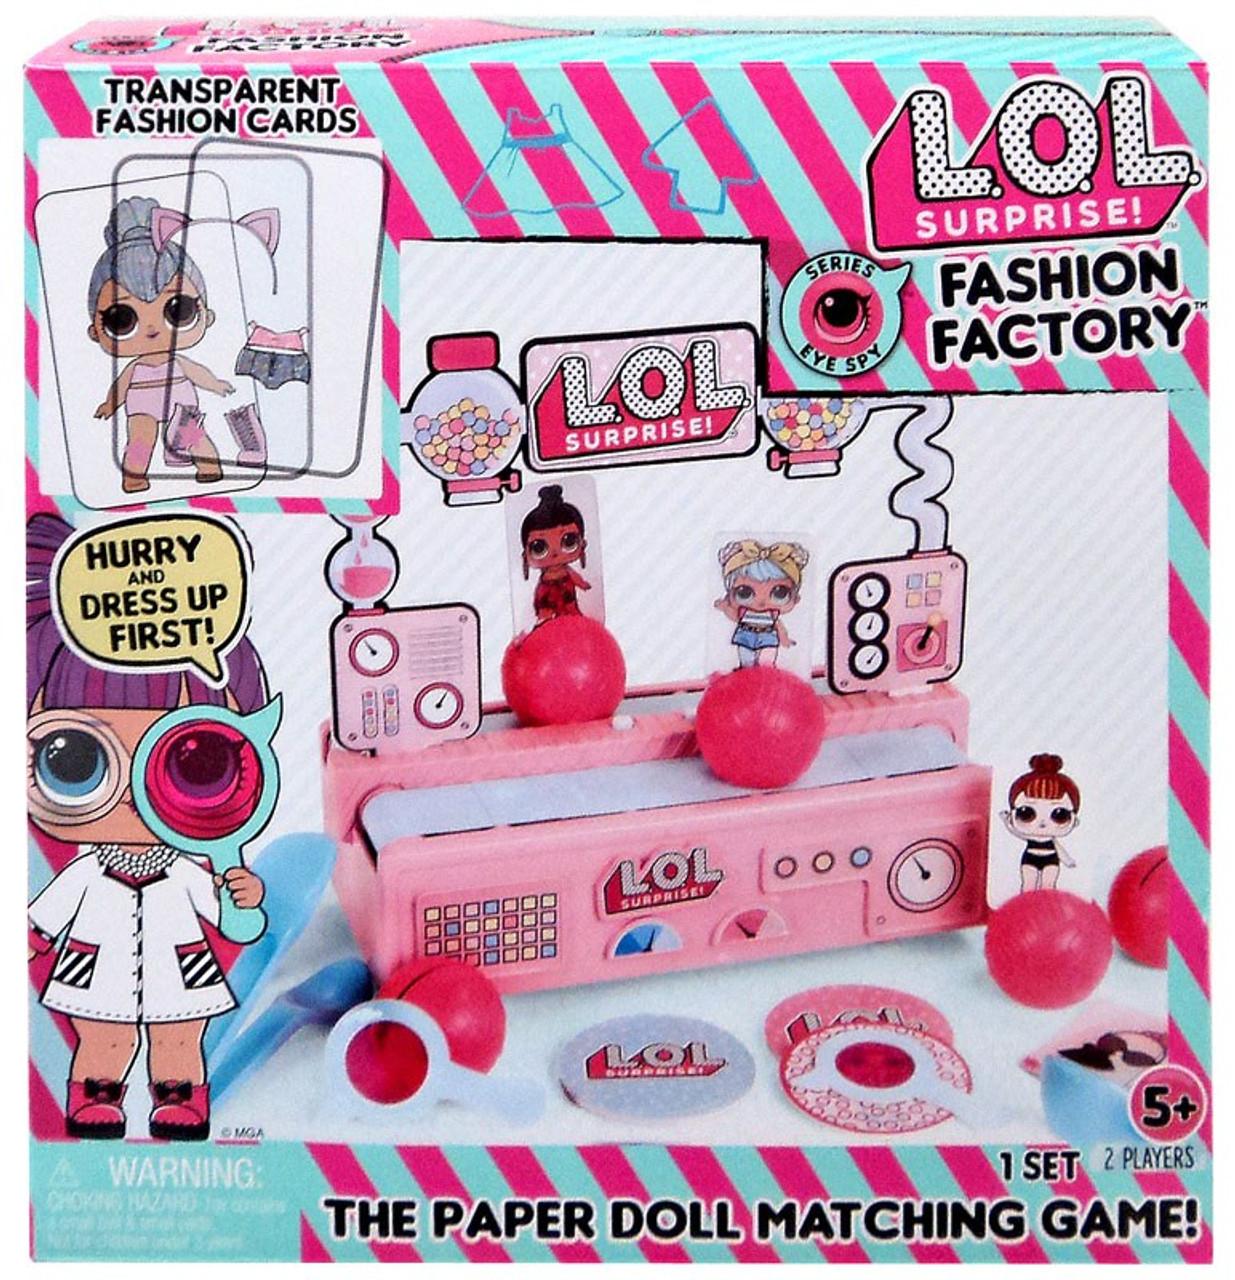 New Toys Surprise: Pass the Surprise Game- Pranksta Toy L.O.L